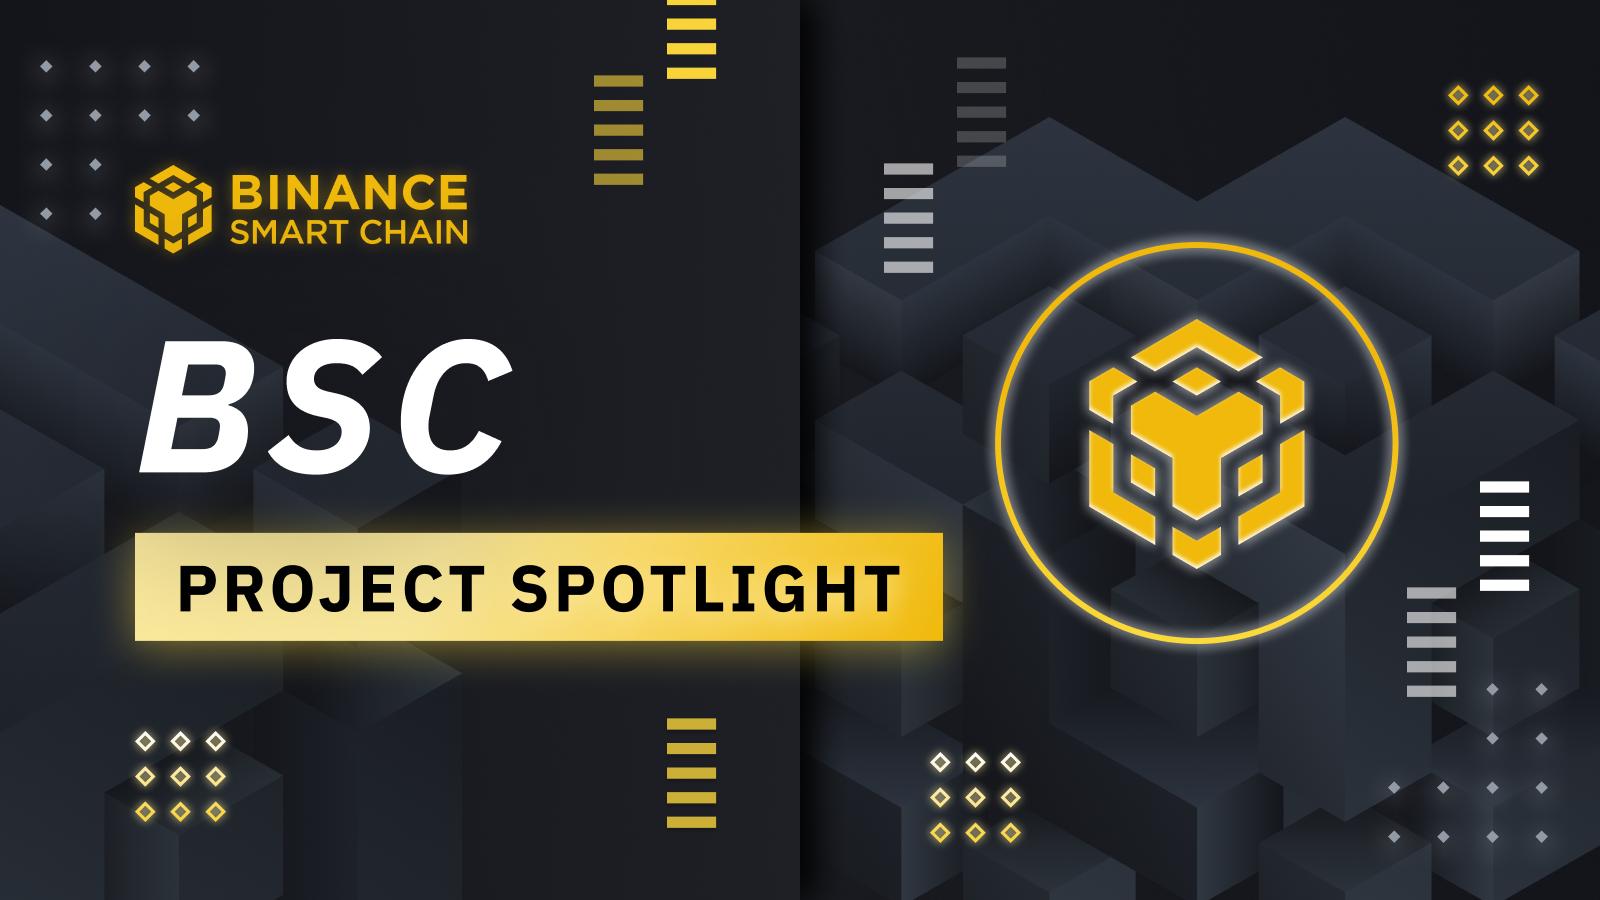 BSC Project Spotlight: BCA Network